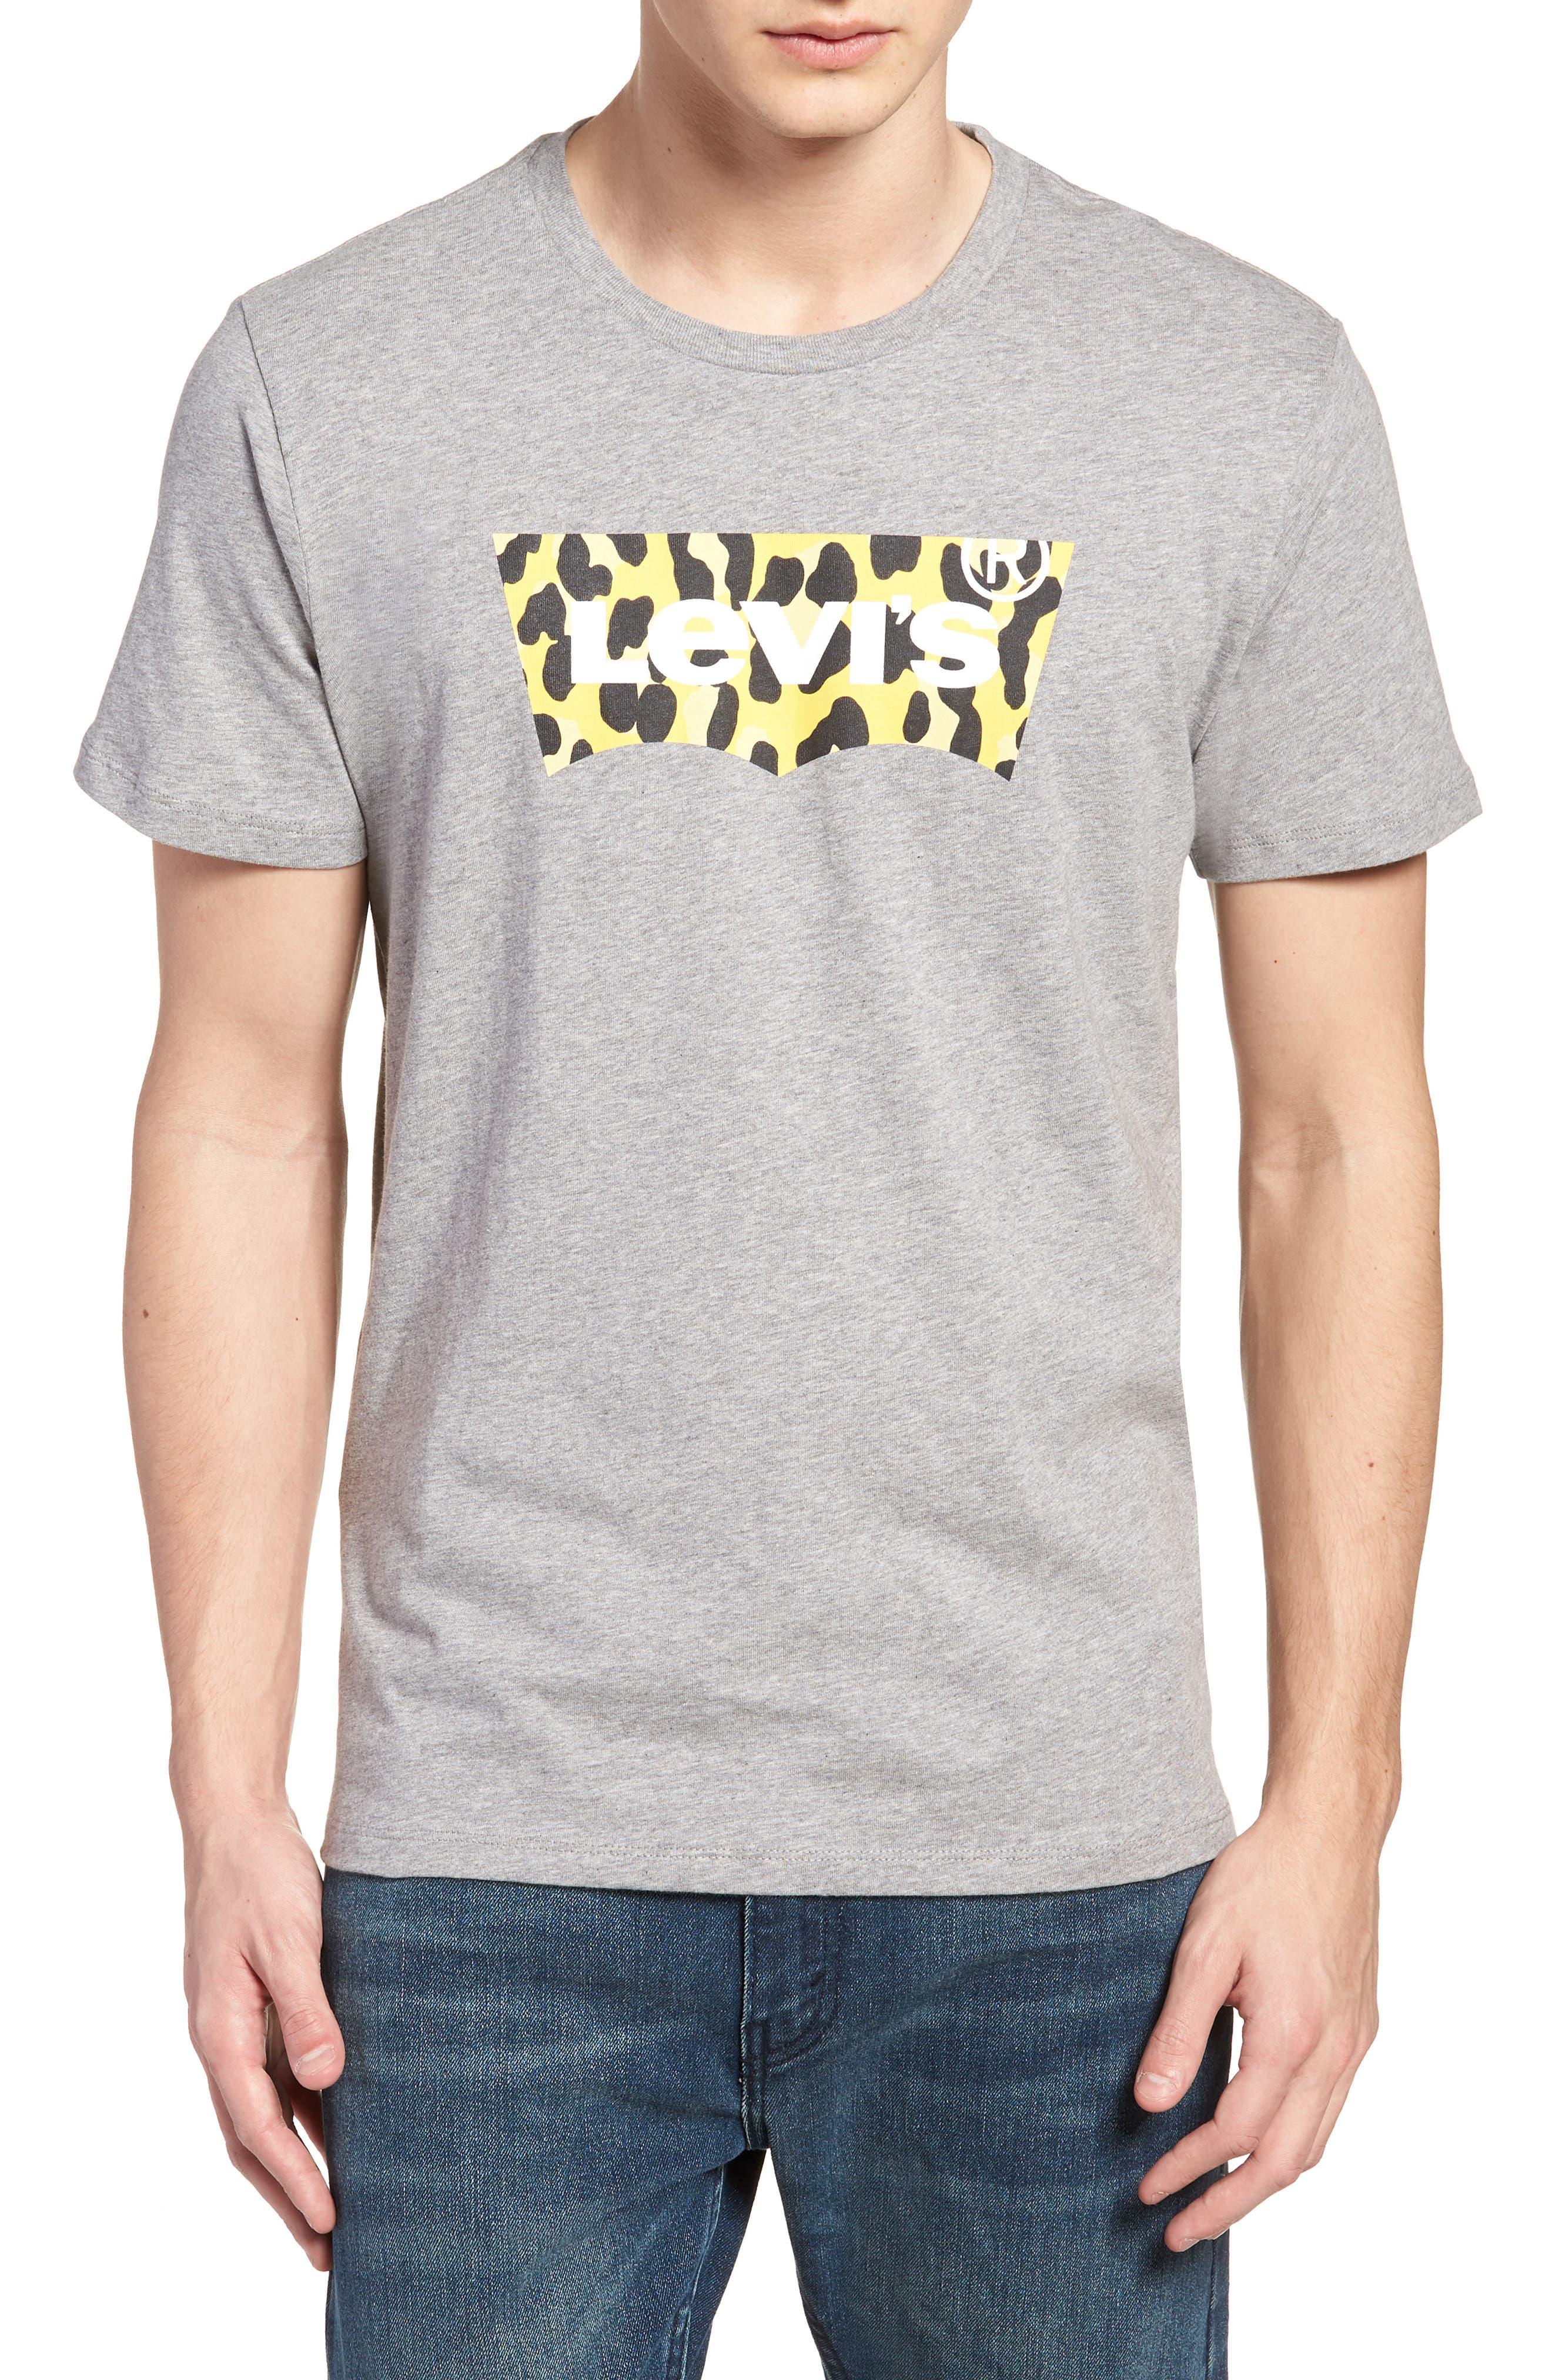 Housemark Graphic T-Shirt,                         Main,                         color, 020